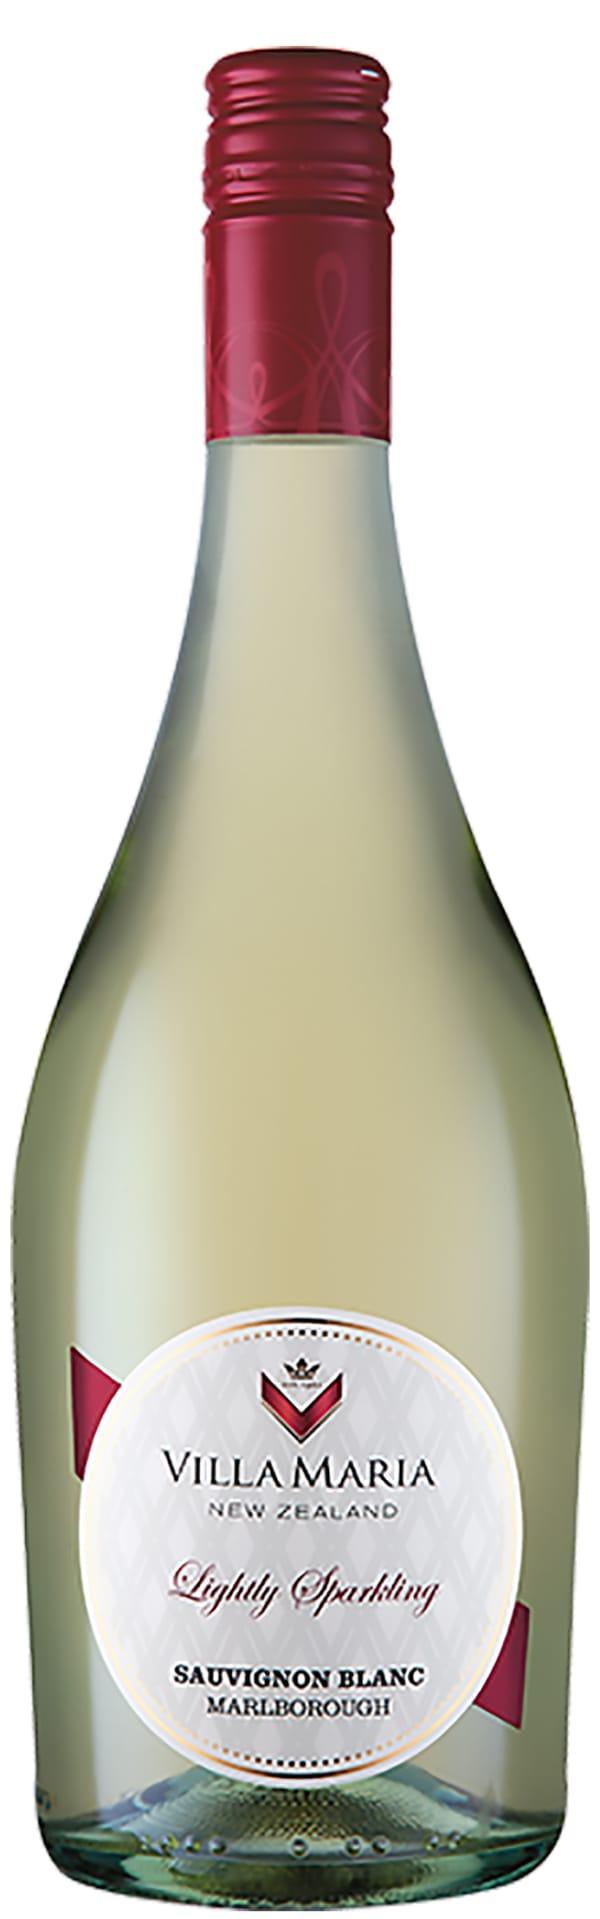 Villa Maria Lightly Sparkling Sauvignon Blanc 2018